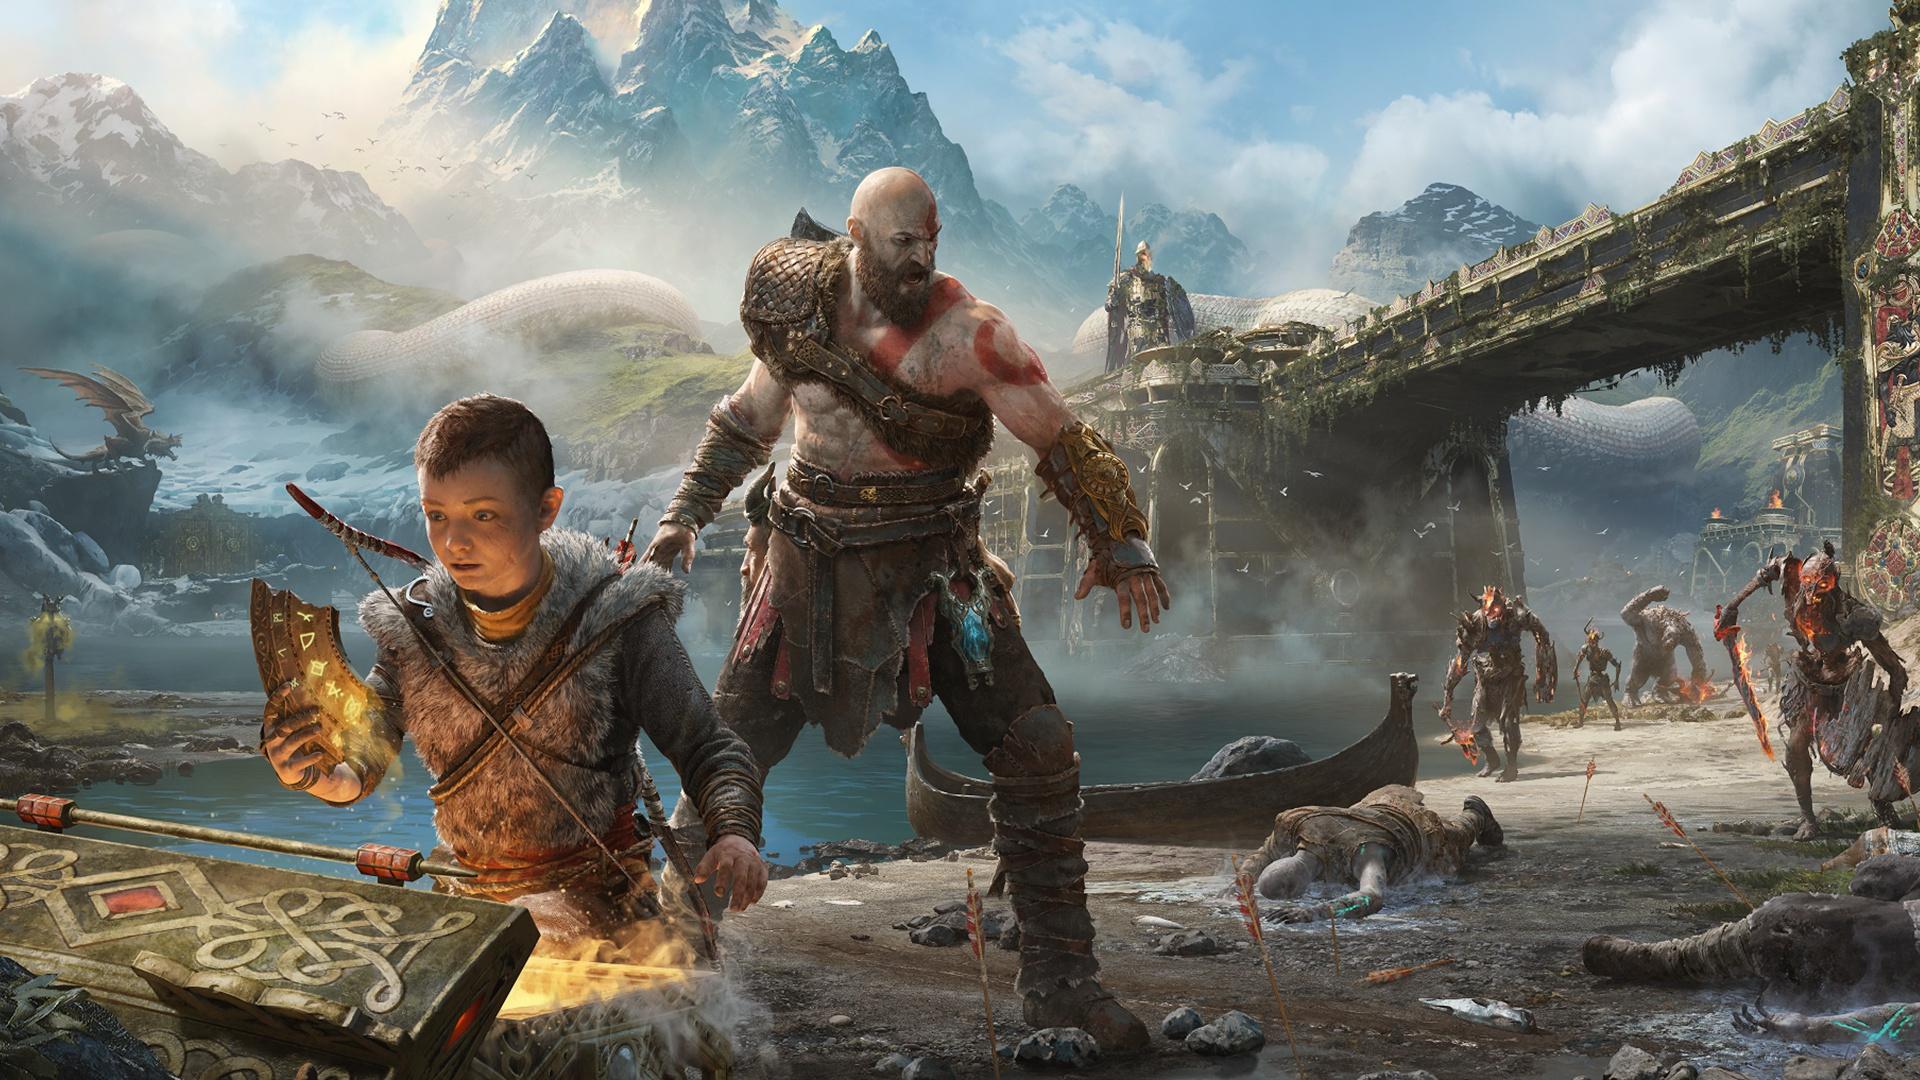 Распродажа в PS Store: Death Stranding, Control, Red Dead Redemption2, God of War